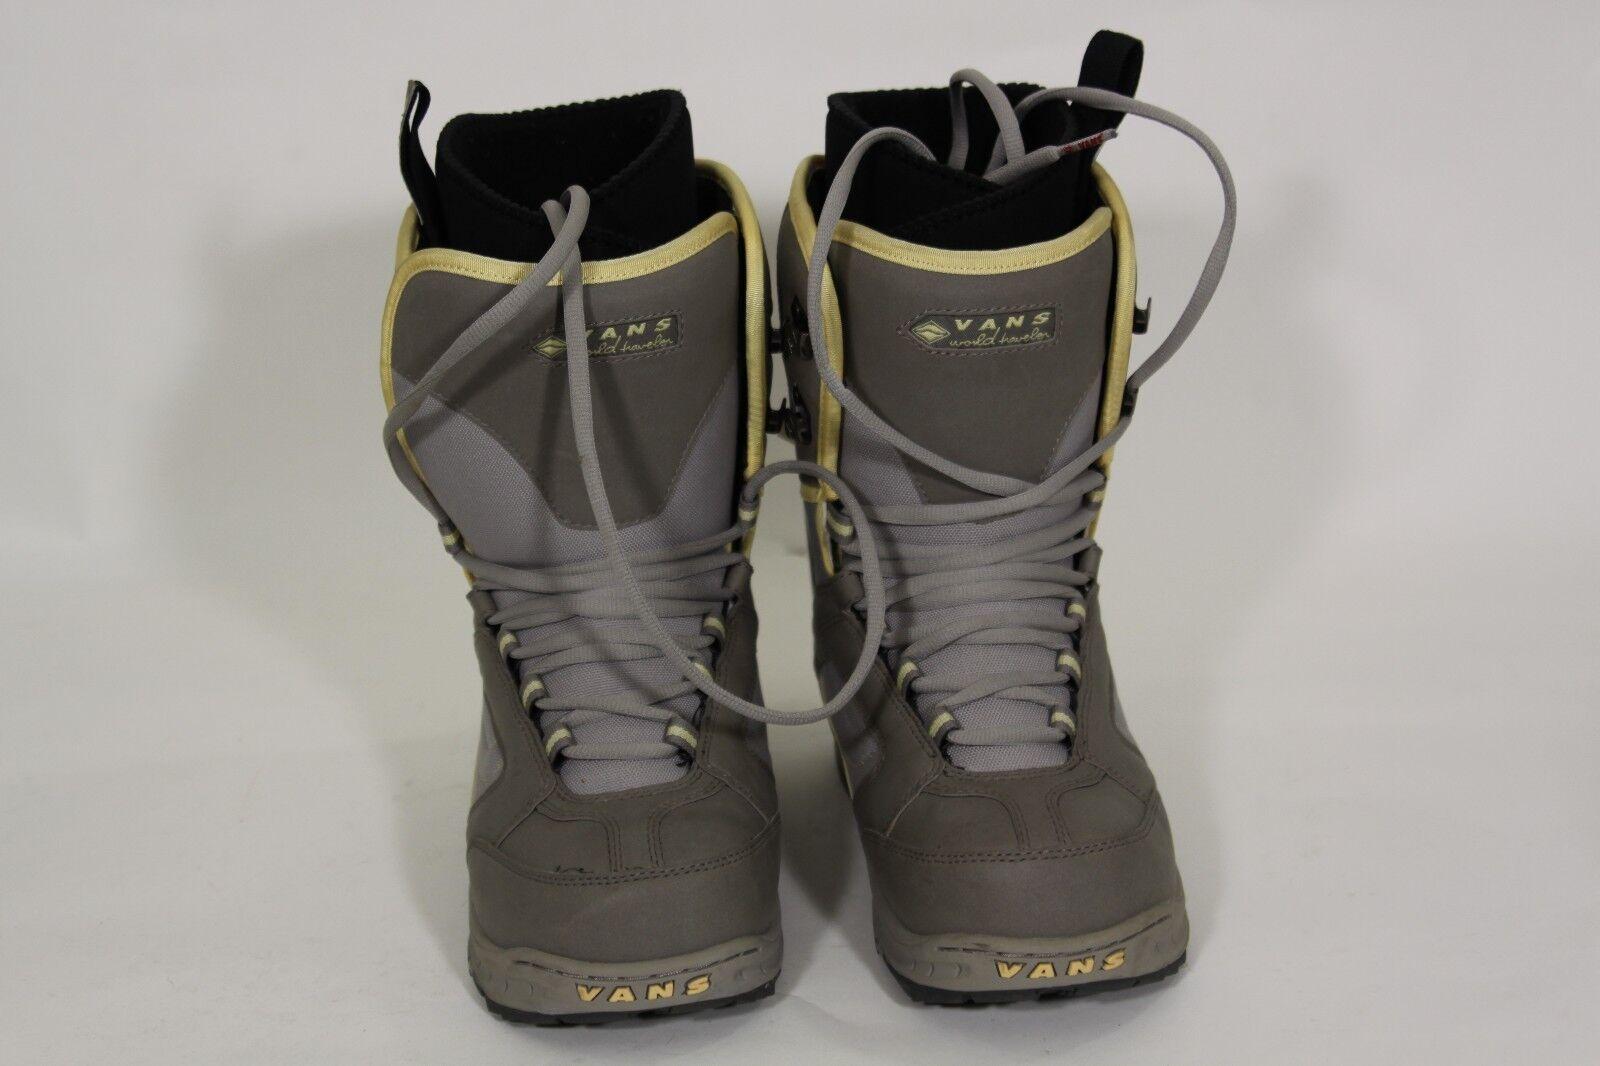 Vans Womens Mantra's Snowboard Boots US 7.5  Tan SB2